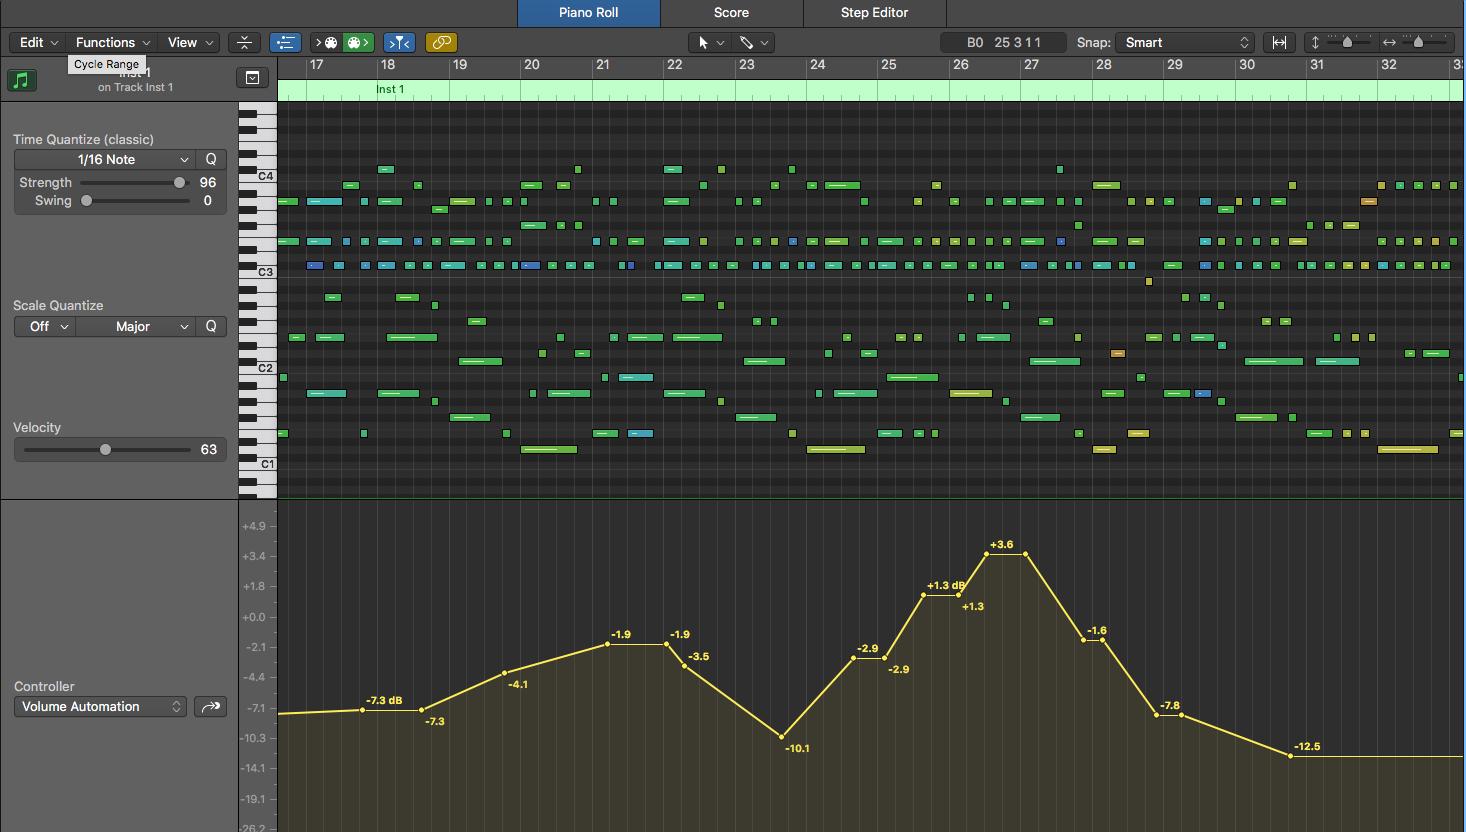 3. MIDI 與 Audio 在 Piano Roll 中編輯方式的差別